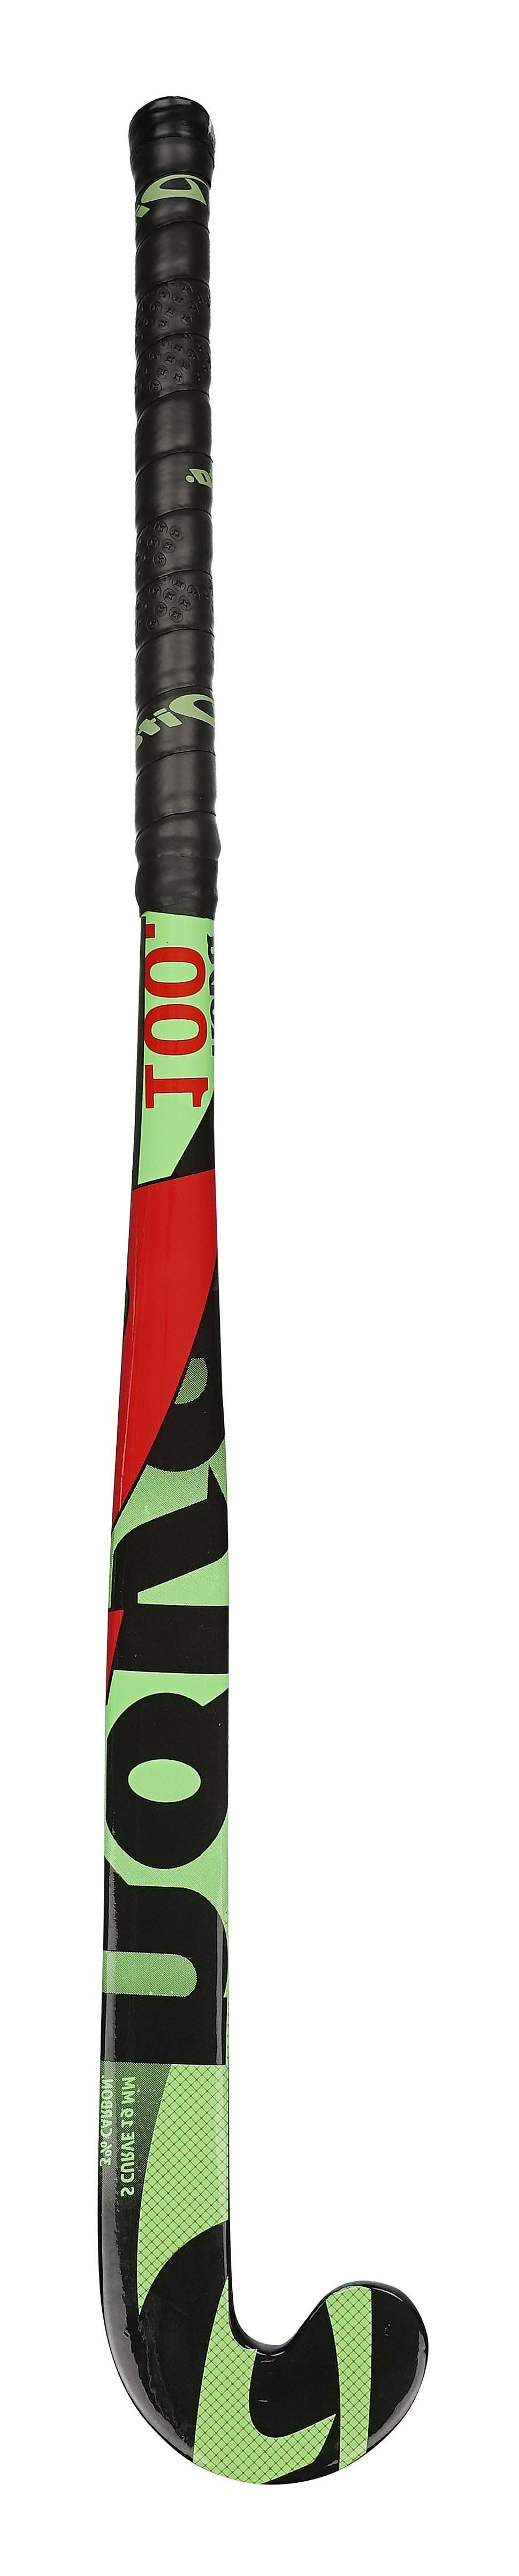 Dita Nova 100 Junior Hockey Stick